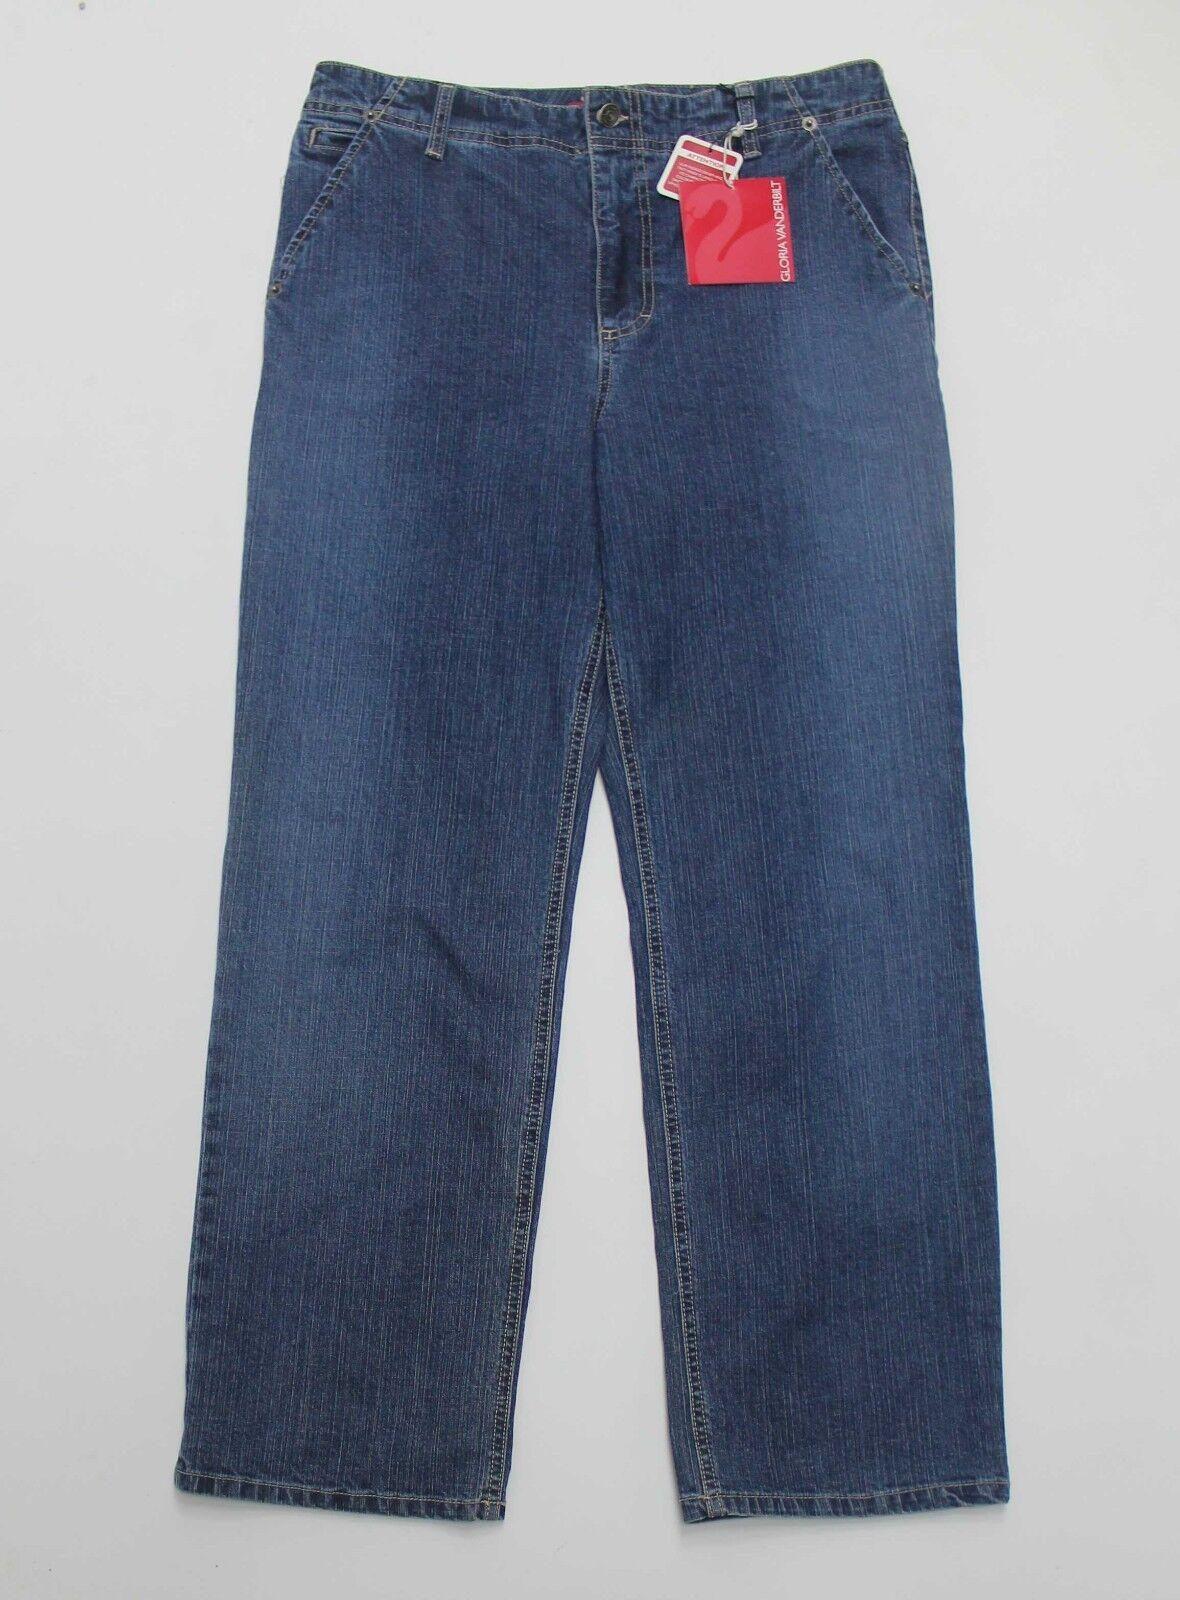 Jeans 14P Stretch Gloria Vanderbilt 14 Petite NEW bluee Indigo NWT K2783X